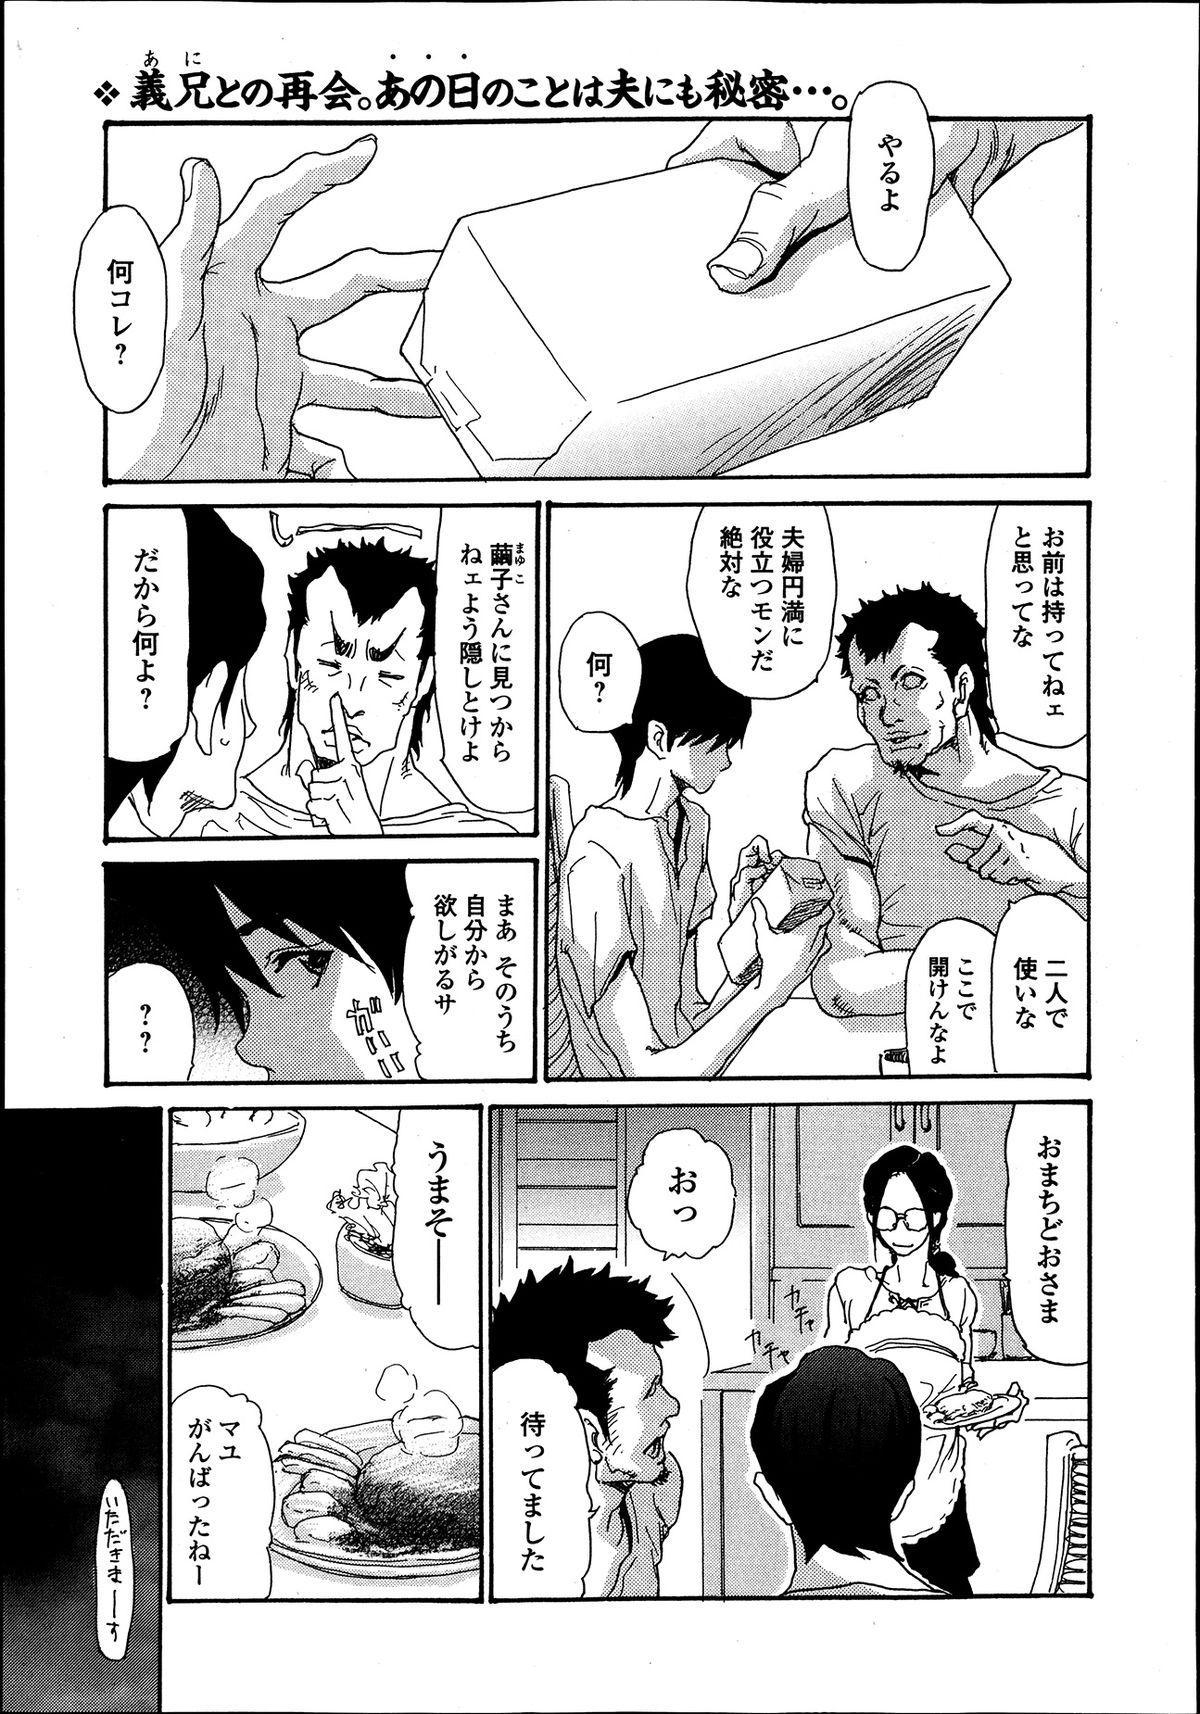 Bishoujo Kakumei KIWAME Road Vol.9 226